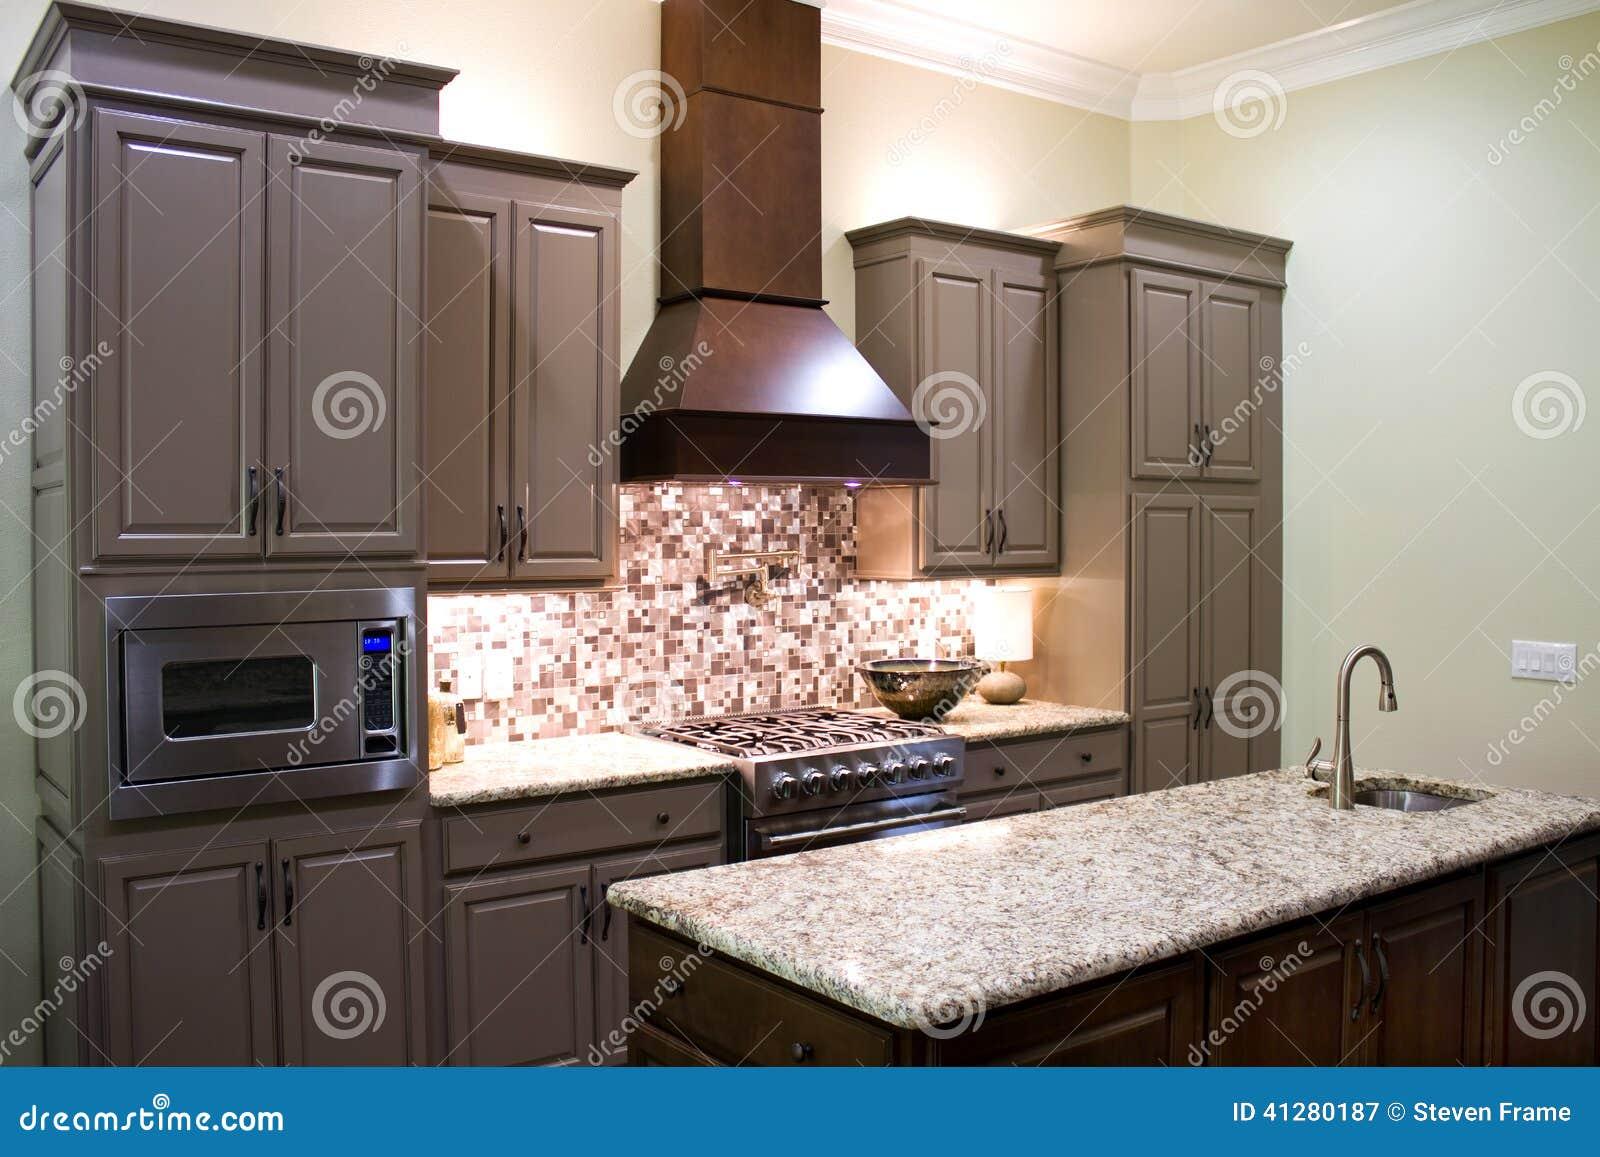 Nieuwe moderne keuken stock afbeelding afbeelding bestaande uit fornuis 41280187 - Fotos moderne keuken ...